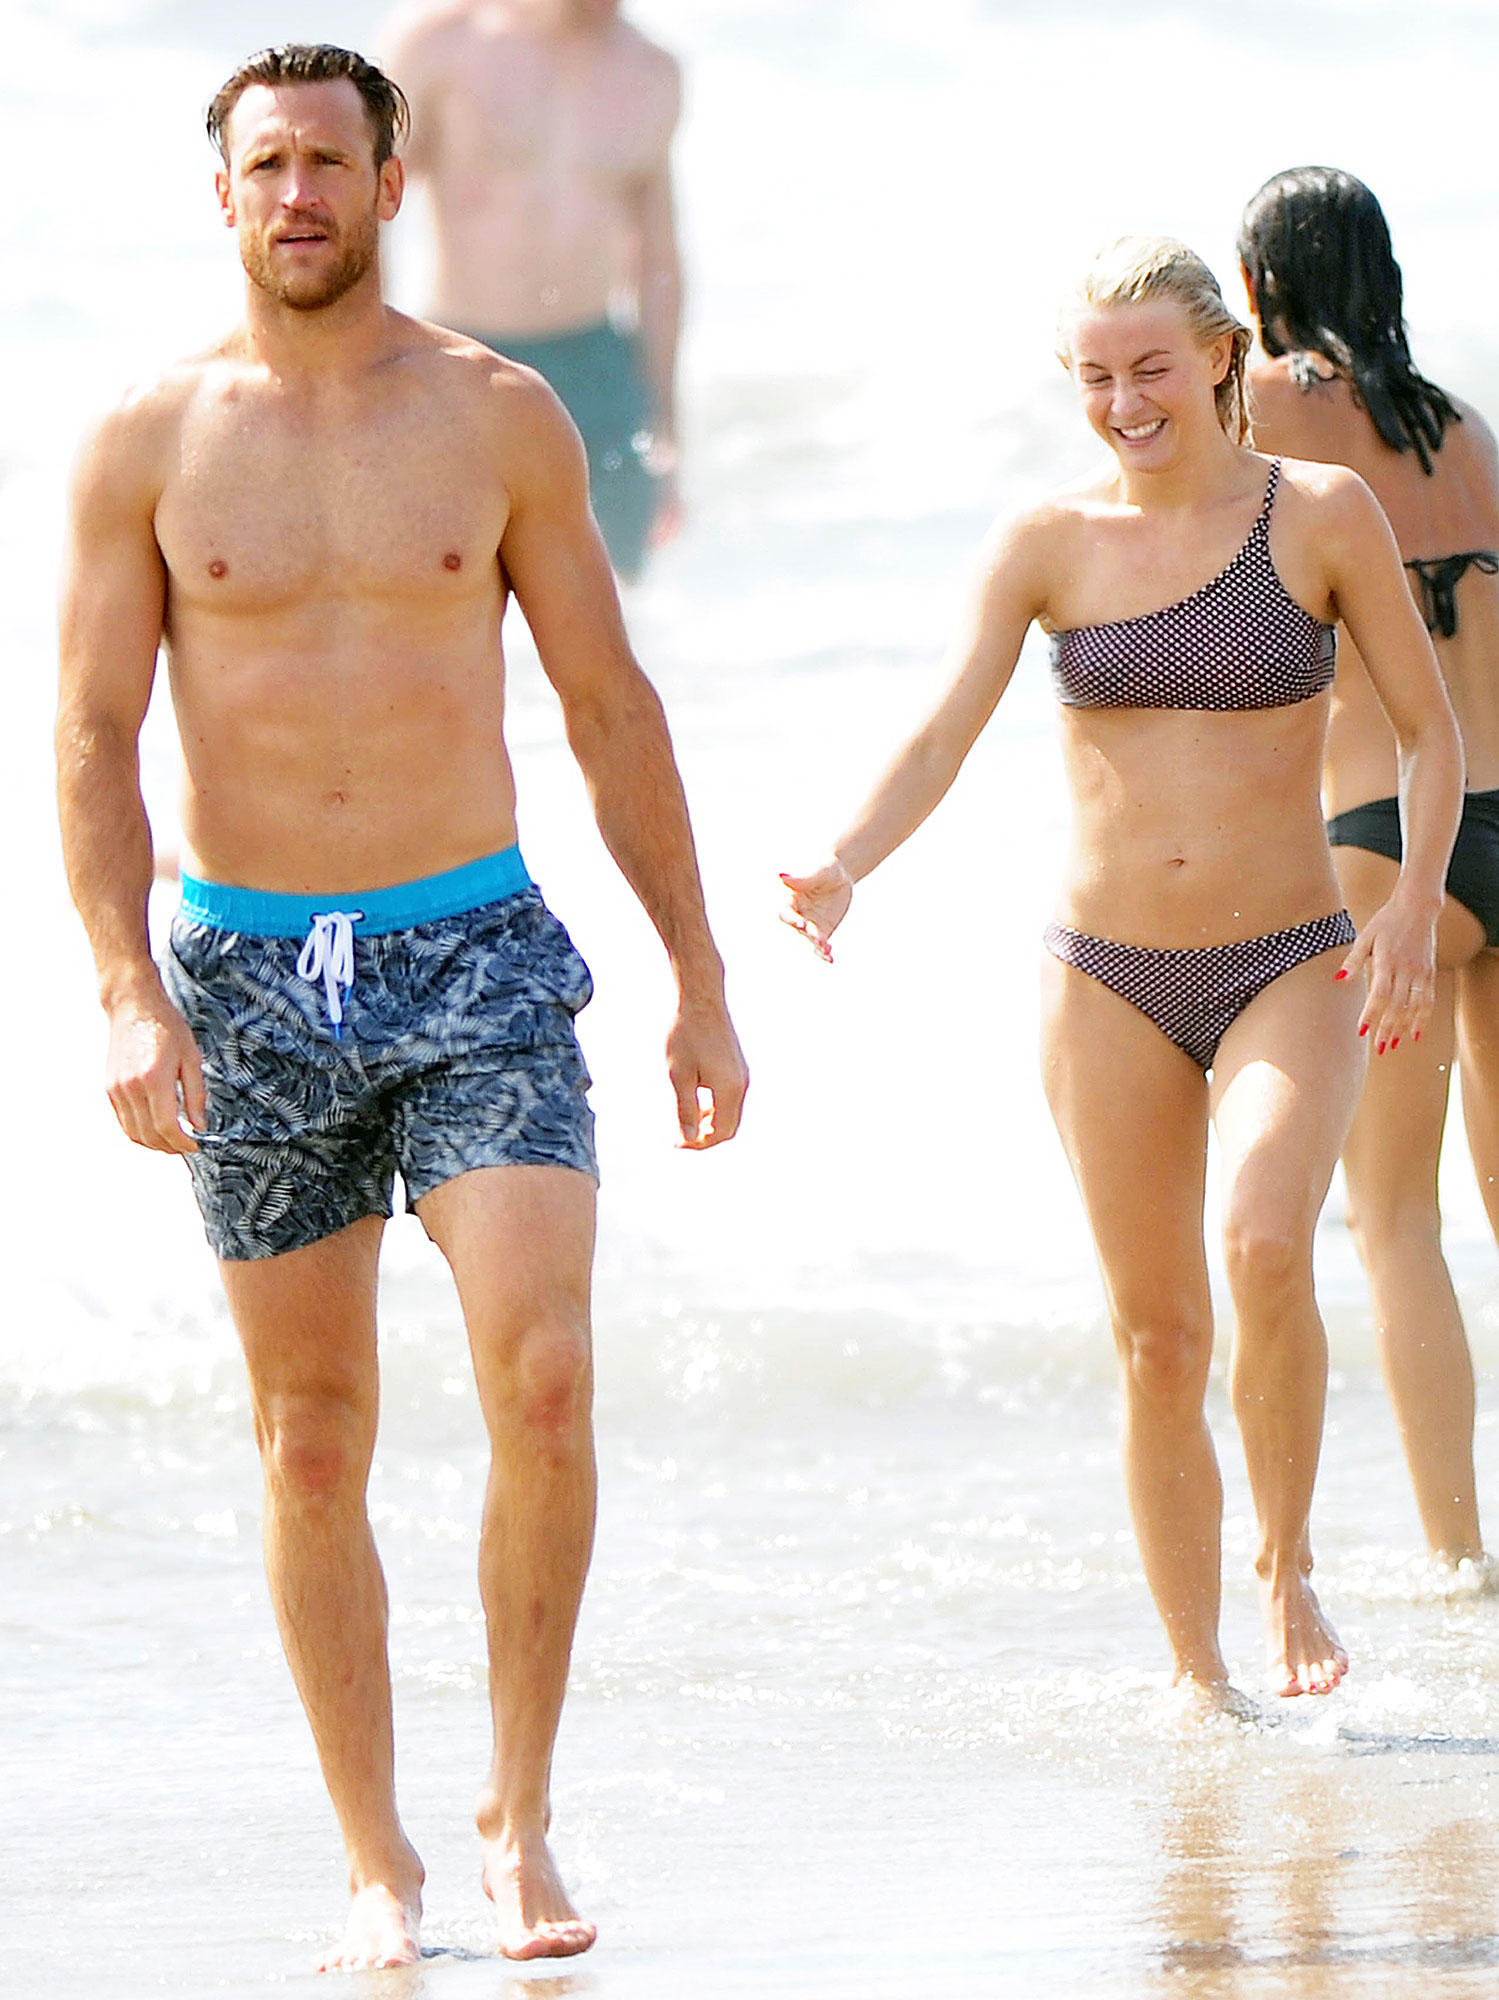 Julianne Hough Marries NHL Player Brooks Laich in Lavish